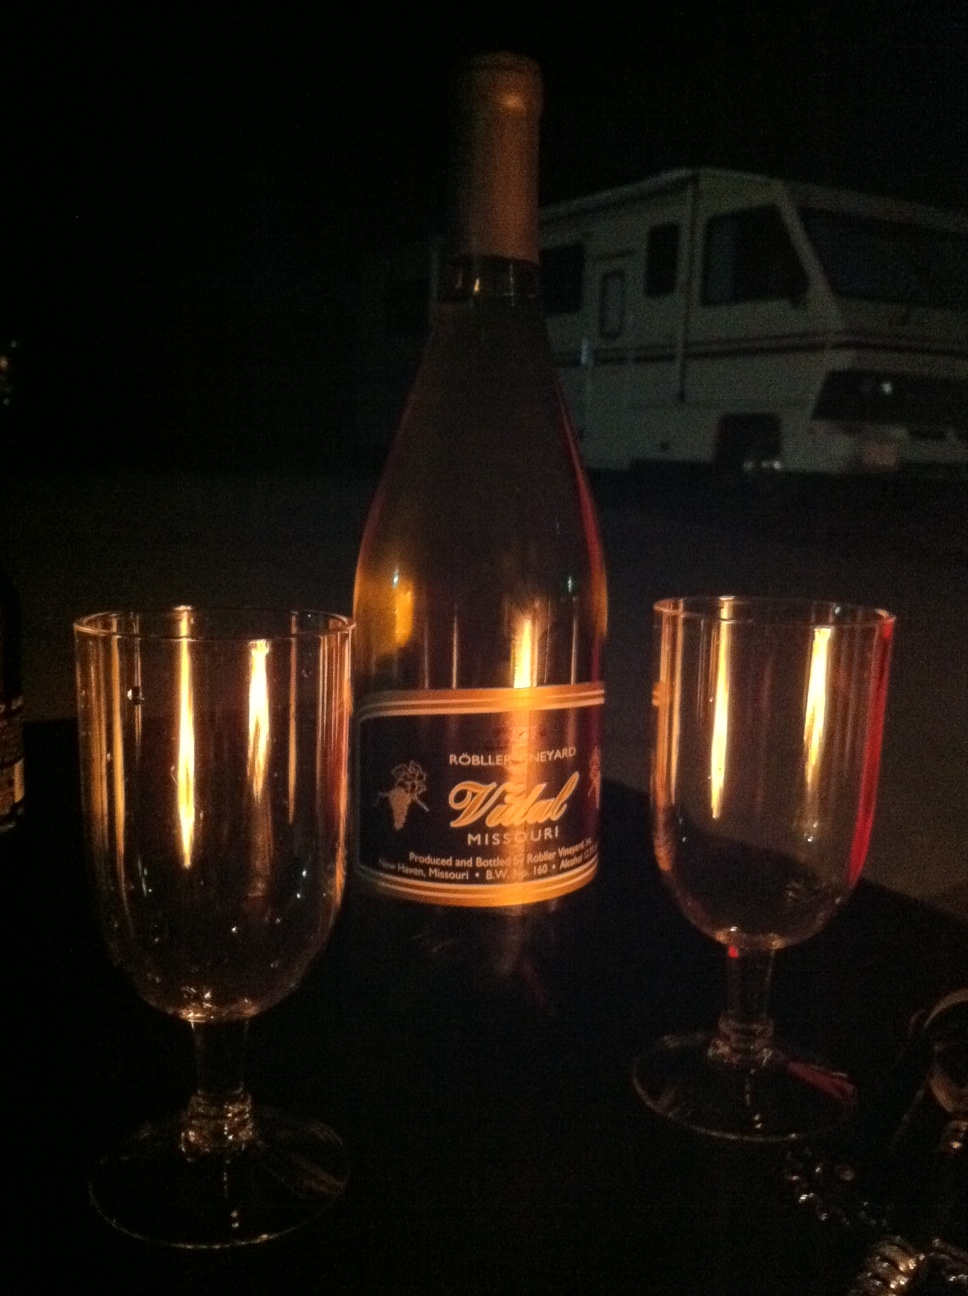 Click image for larger version  Name:Wine-Glasses-RVbackround.JPG Views:85 Size:361.2 KB ID:14463